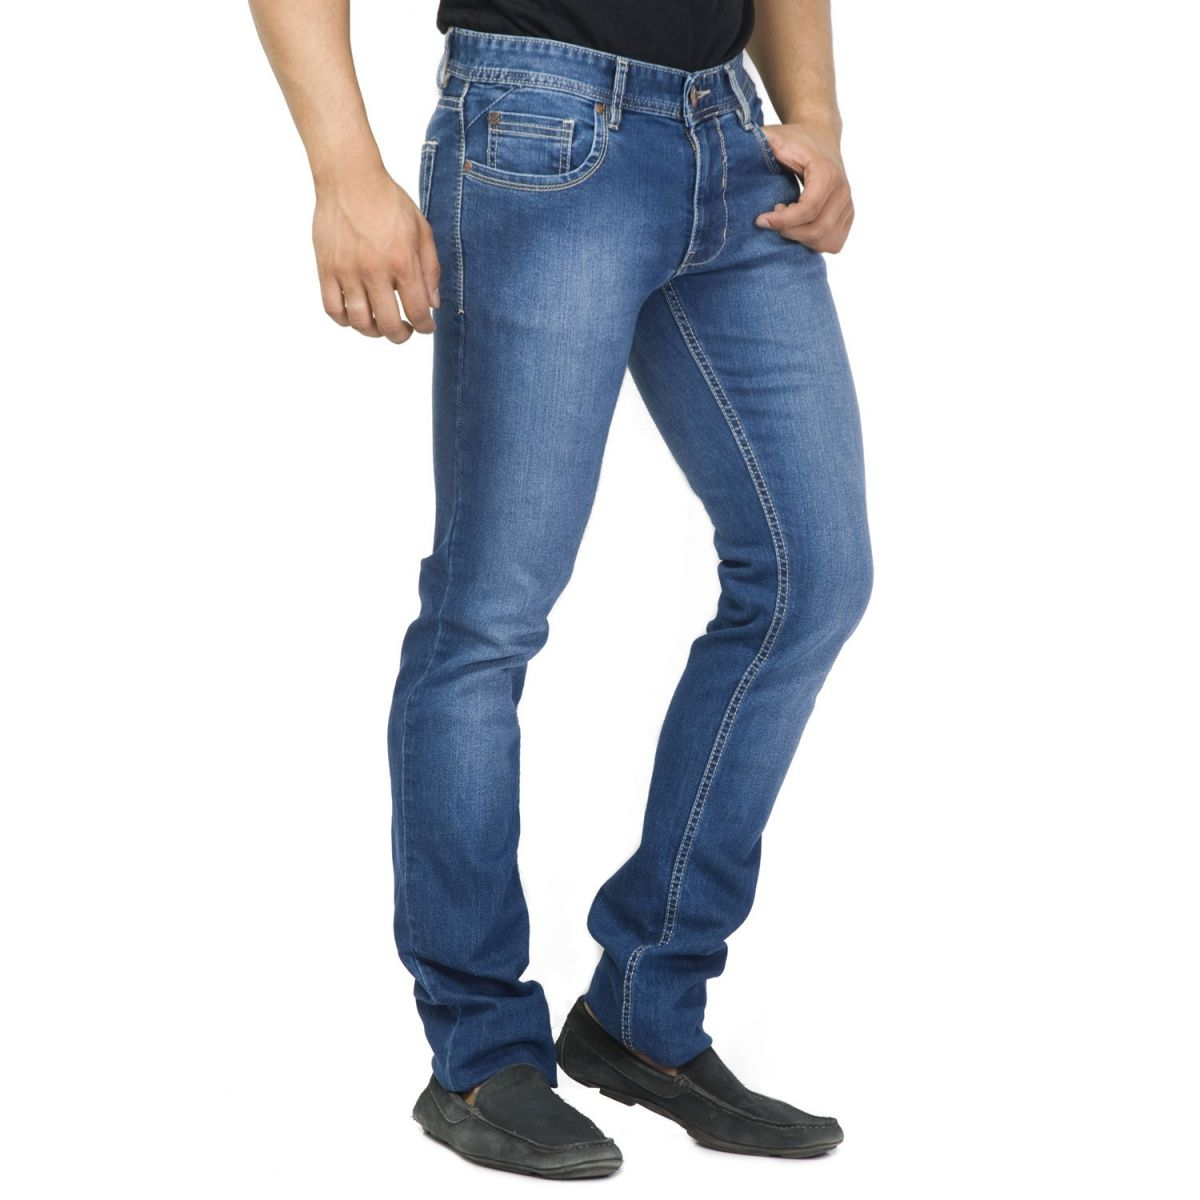 Kit C/ 30 Calças Jeans Masculinas Diversas Marcas